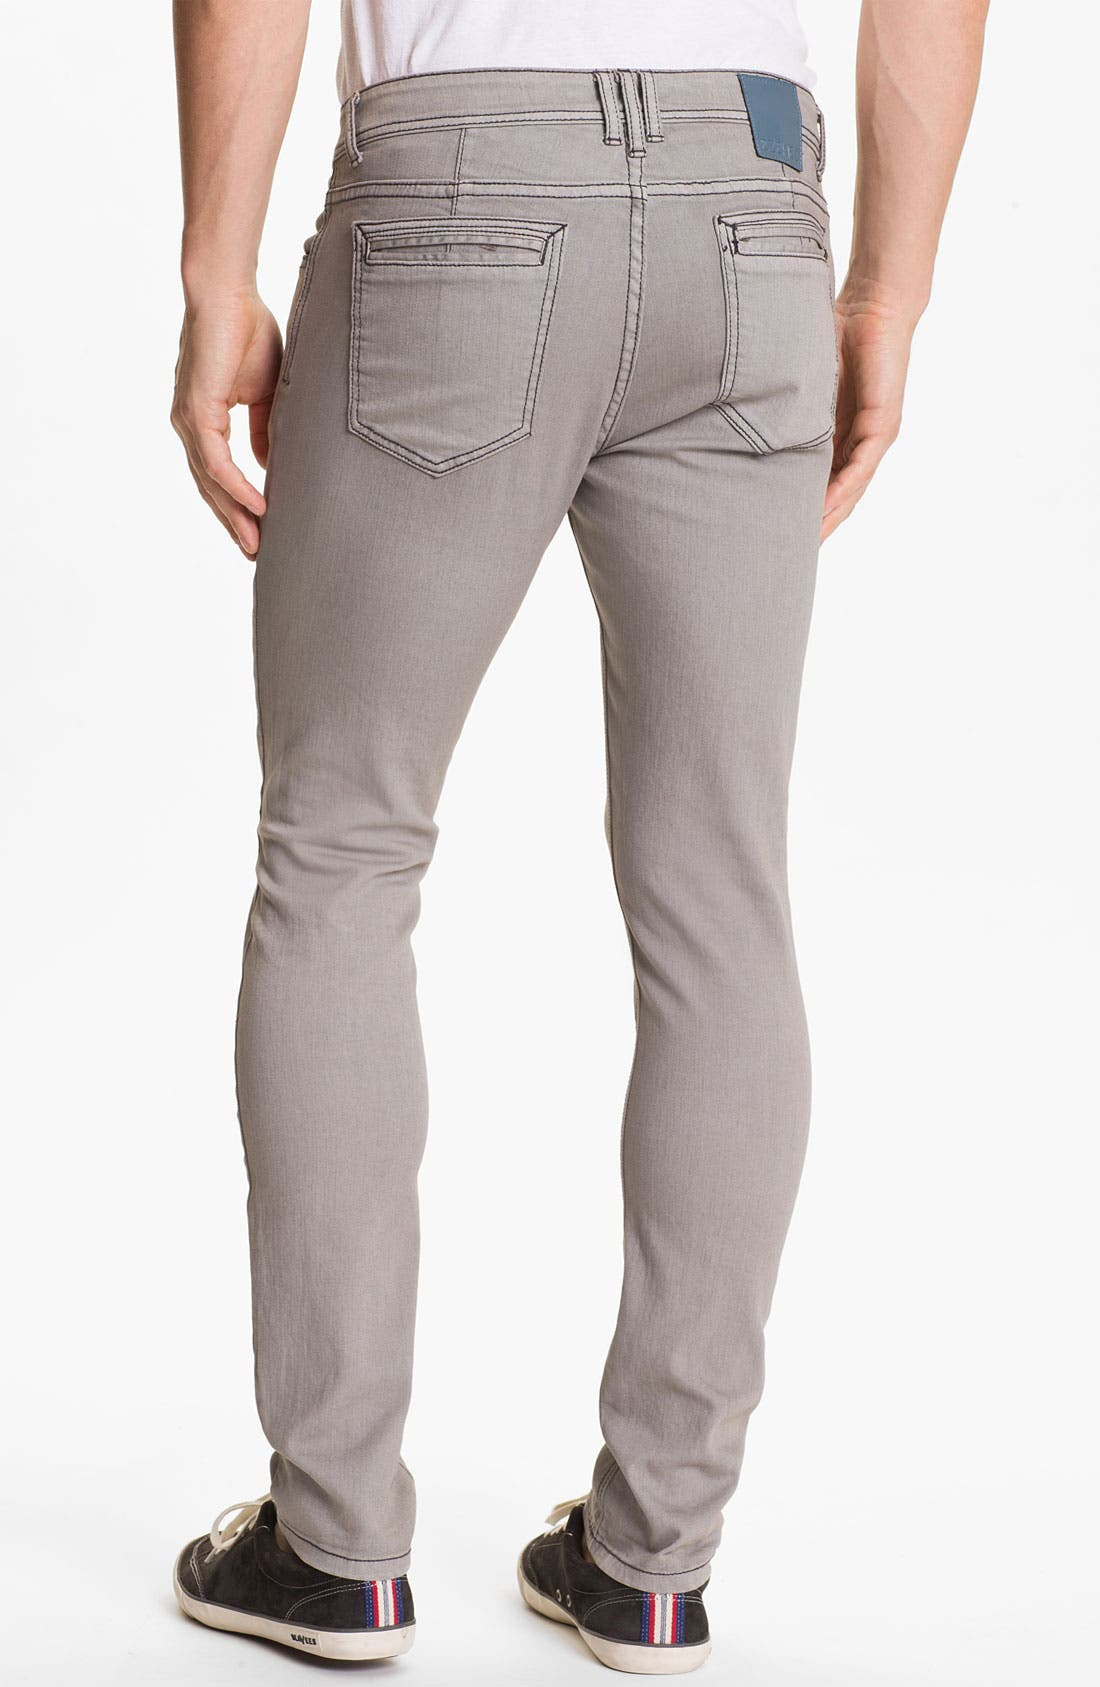 Alternate Image 1 Selected - Ezekiel 'Chopper' Slim Straight Leg Jeans (Light Grey)